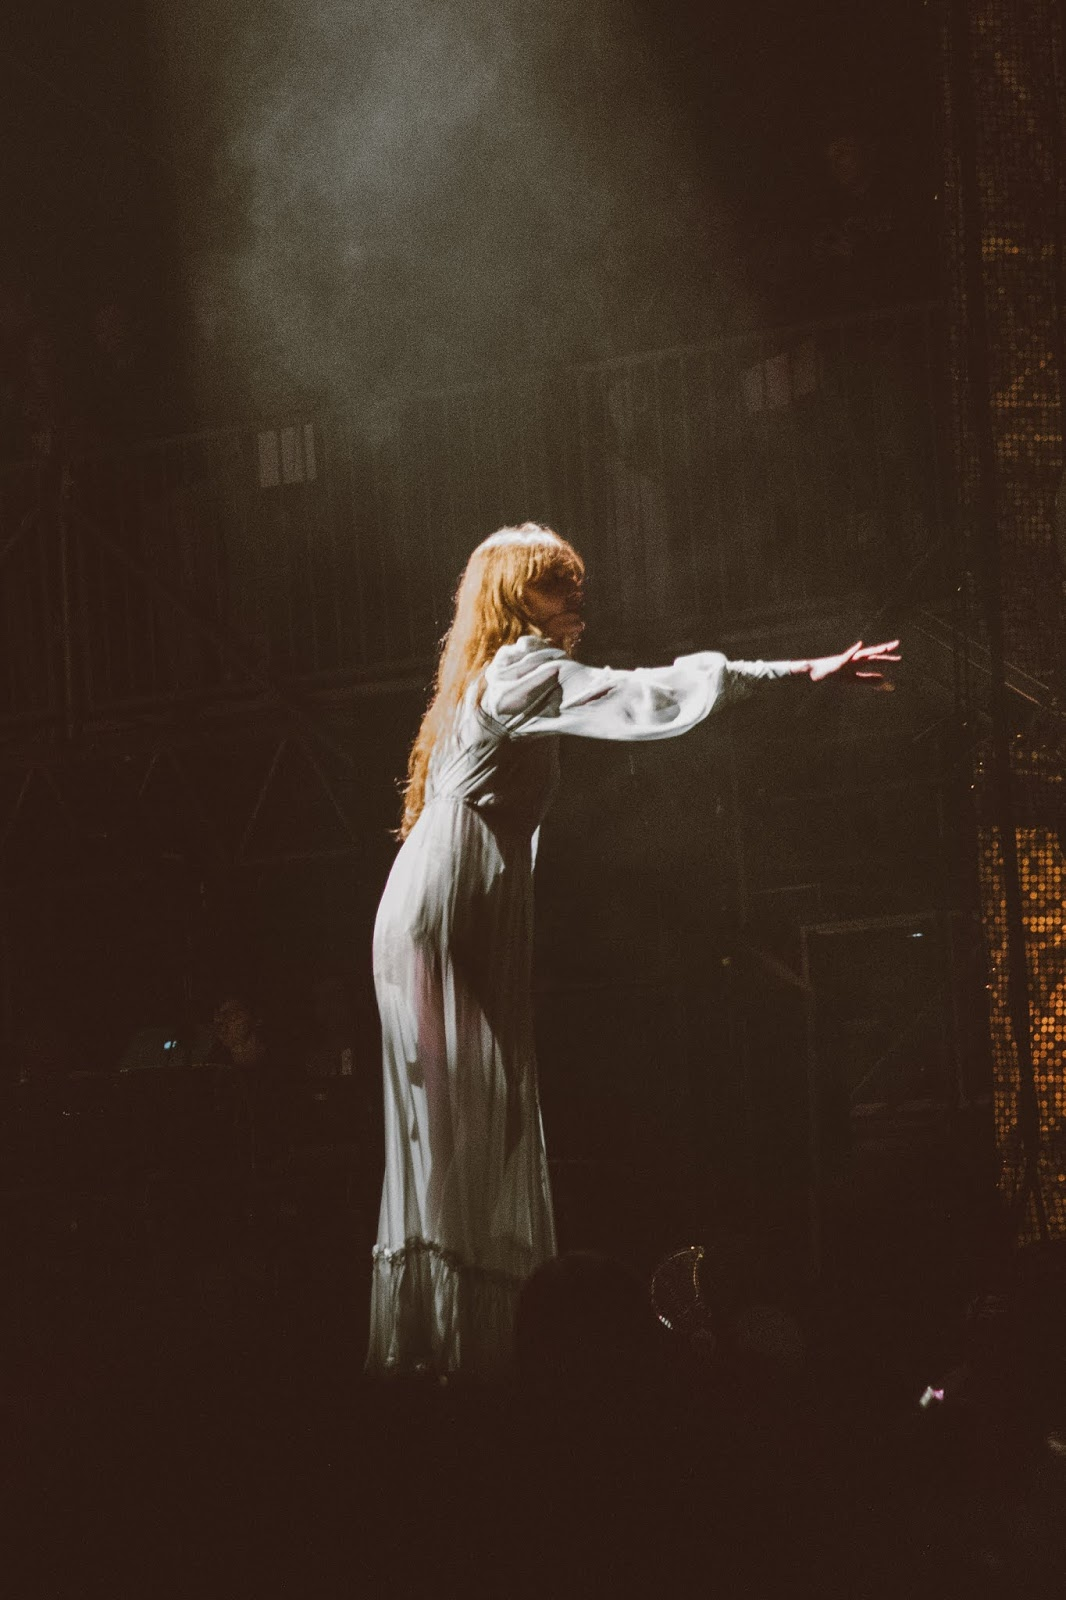 Shelly Stuckman, ArizonaGirl.com, music festival, music festival essentials, Outside Lands, outside lands review, san francisco, Florence + the Machine